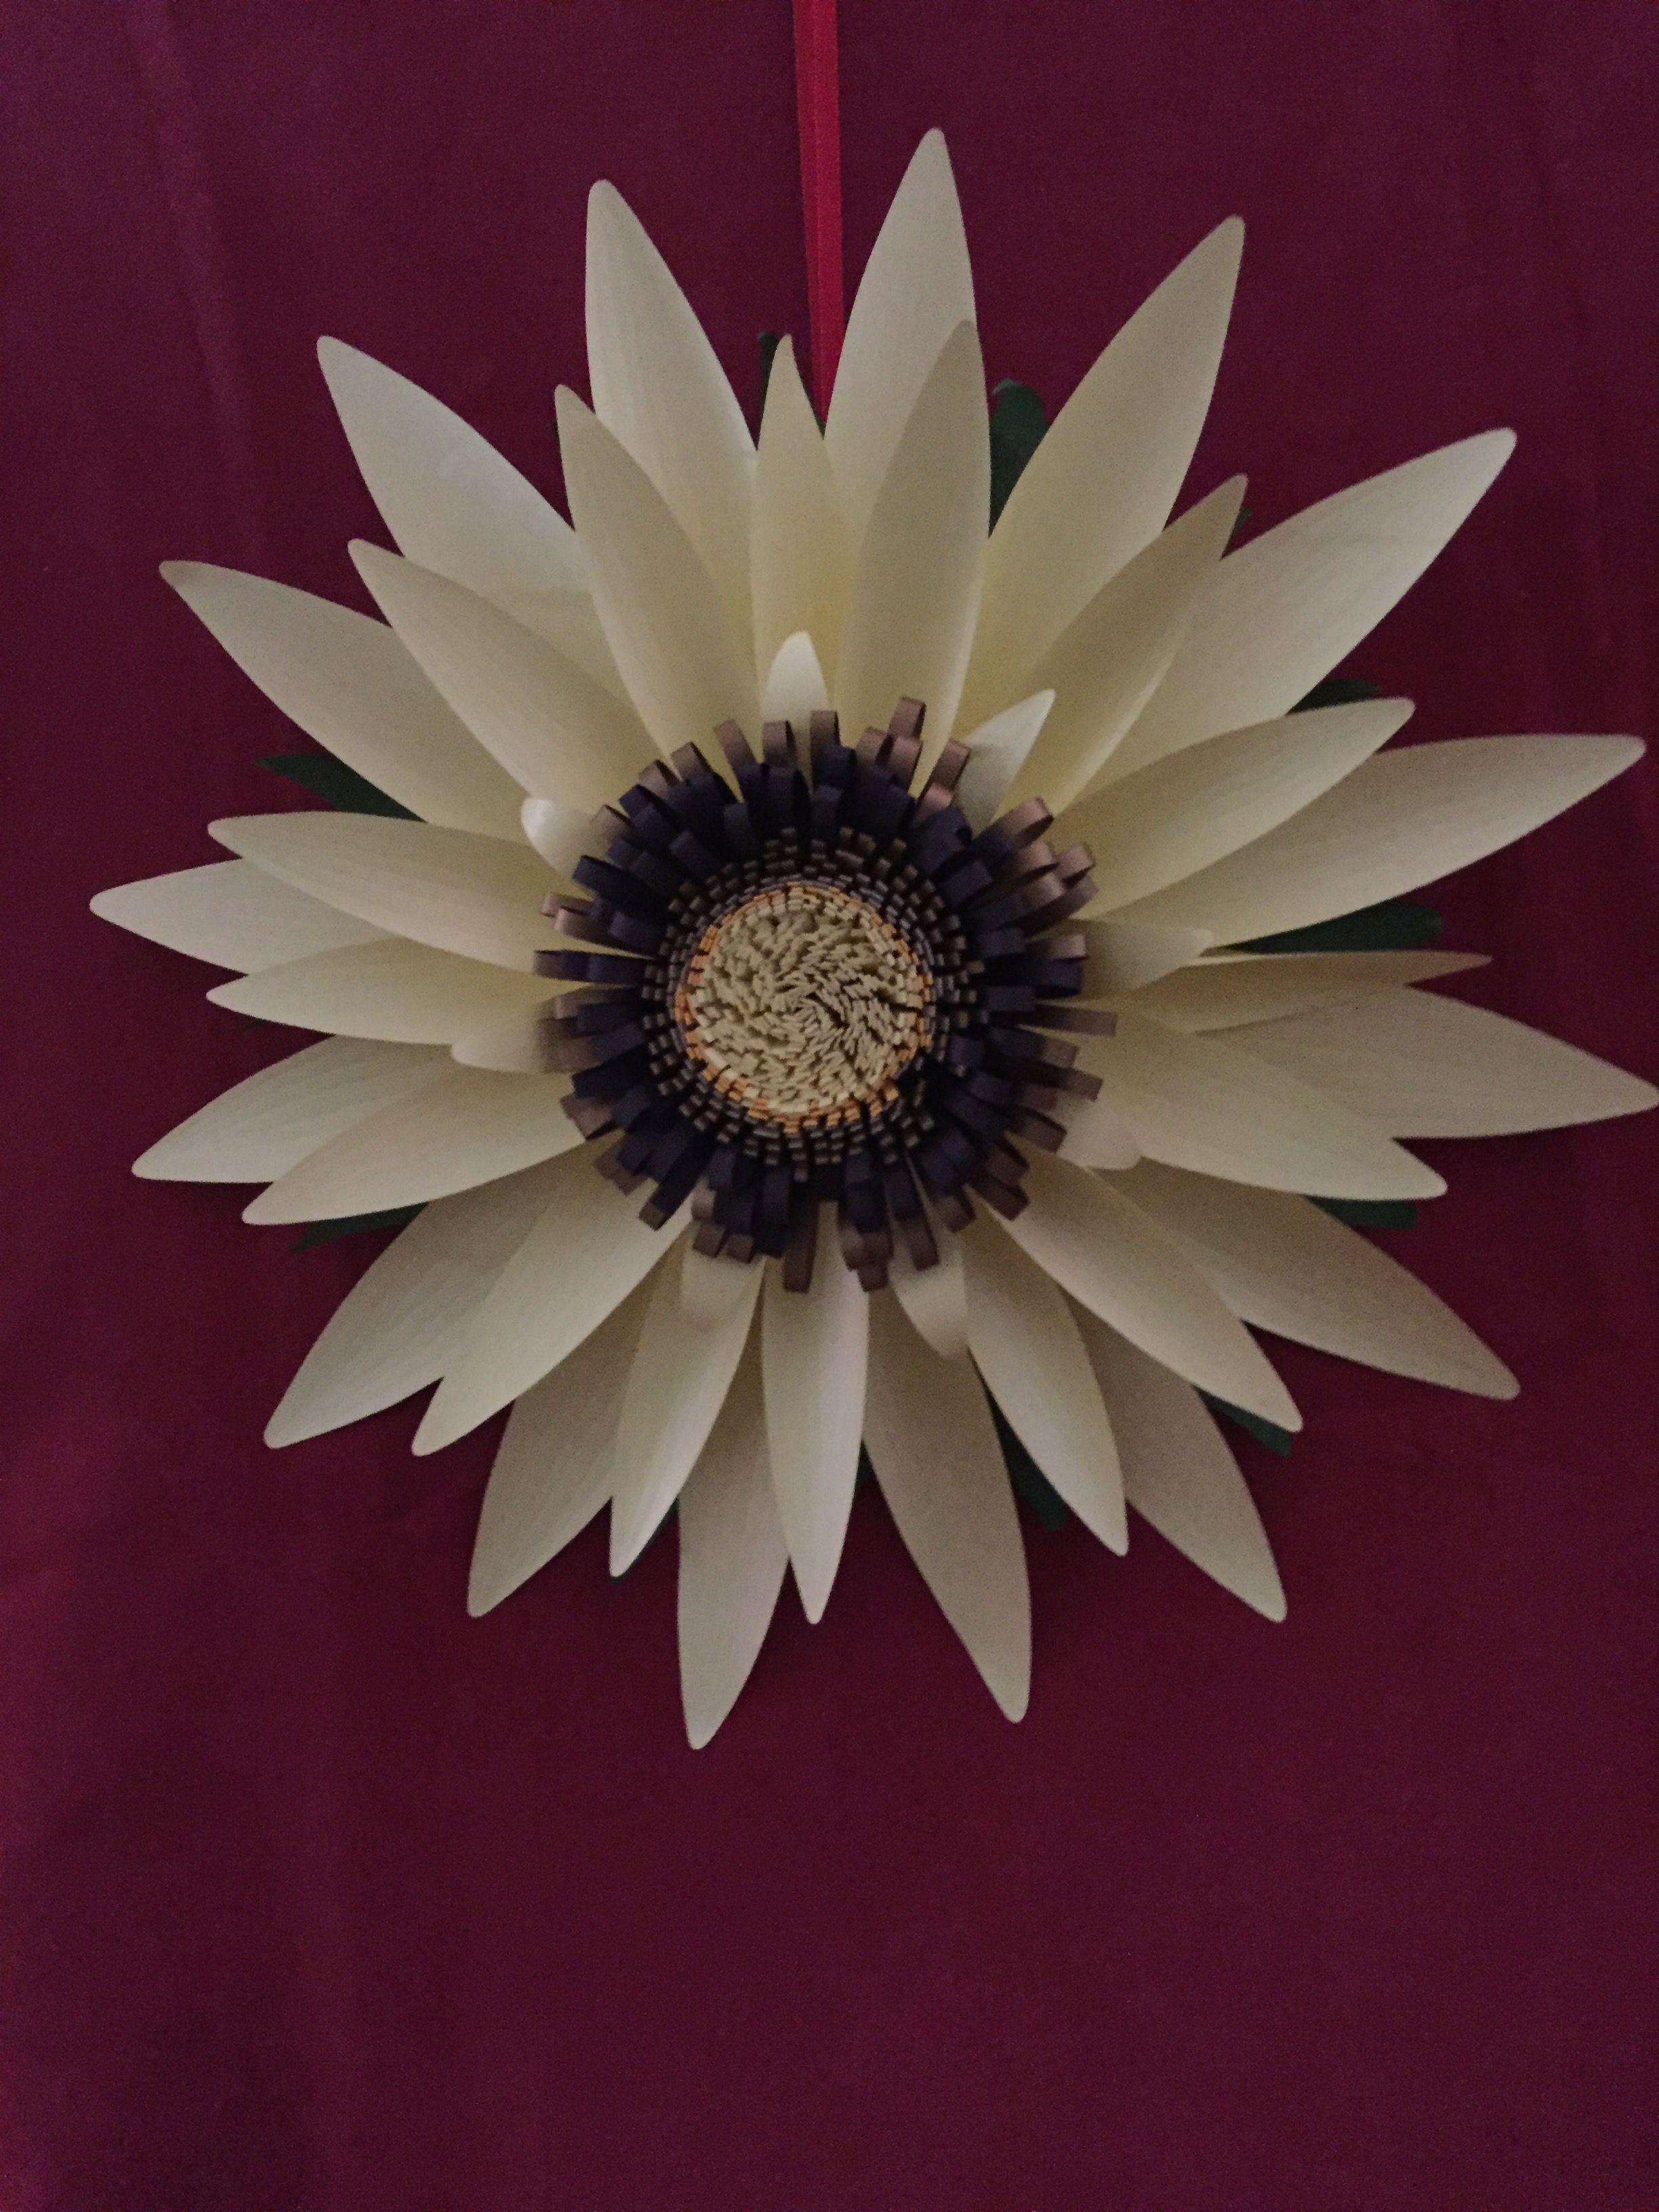 Pin By Lois Smyczynski On My Paper Flower Designs Pinterest